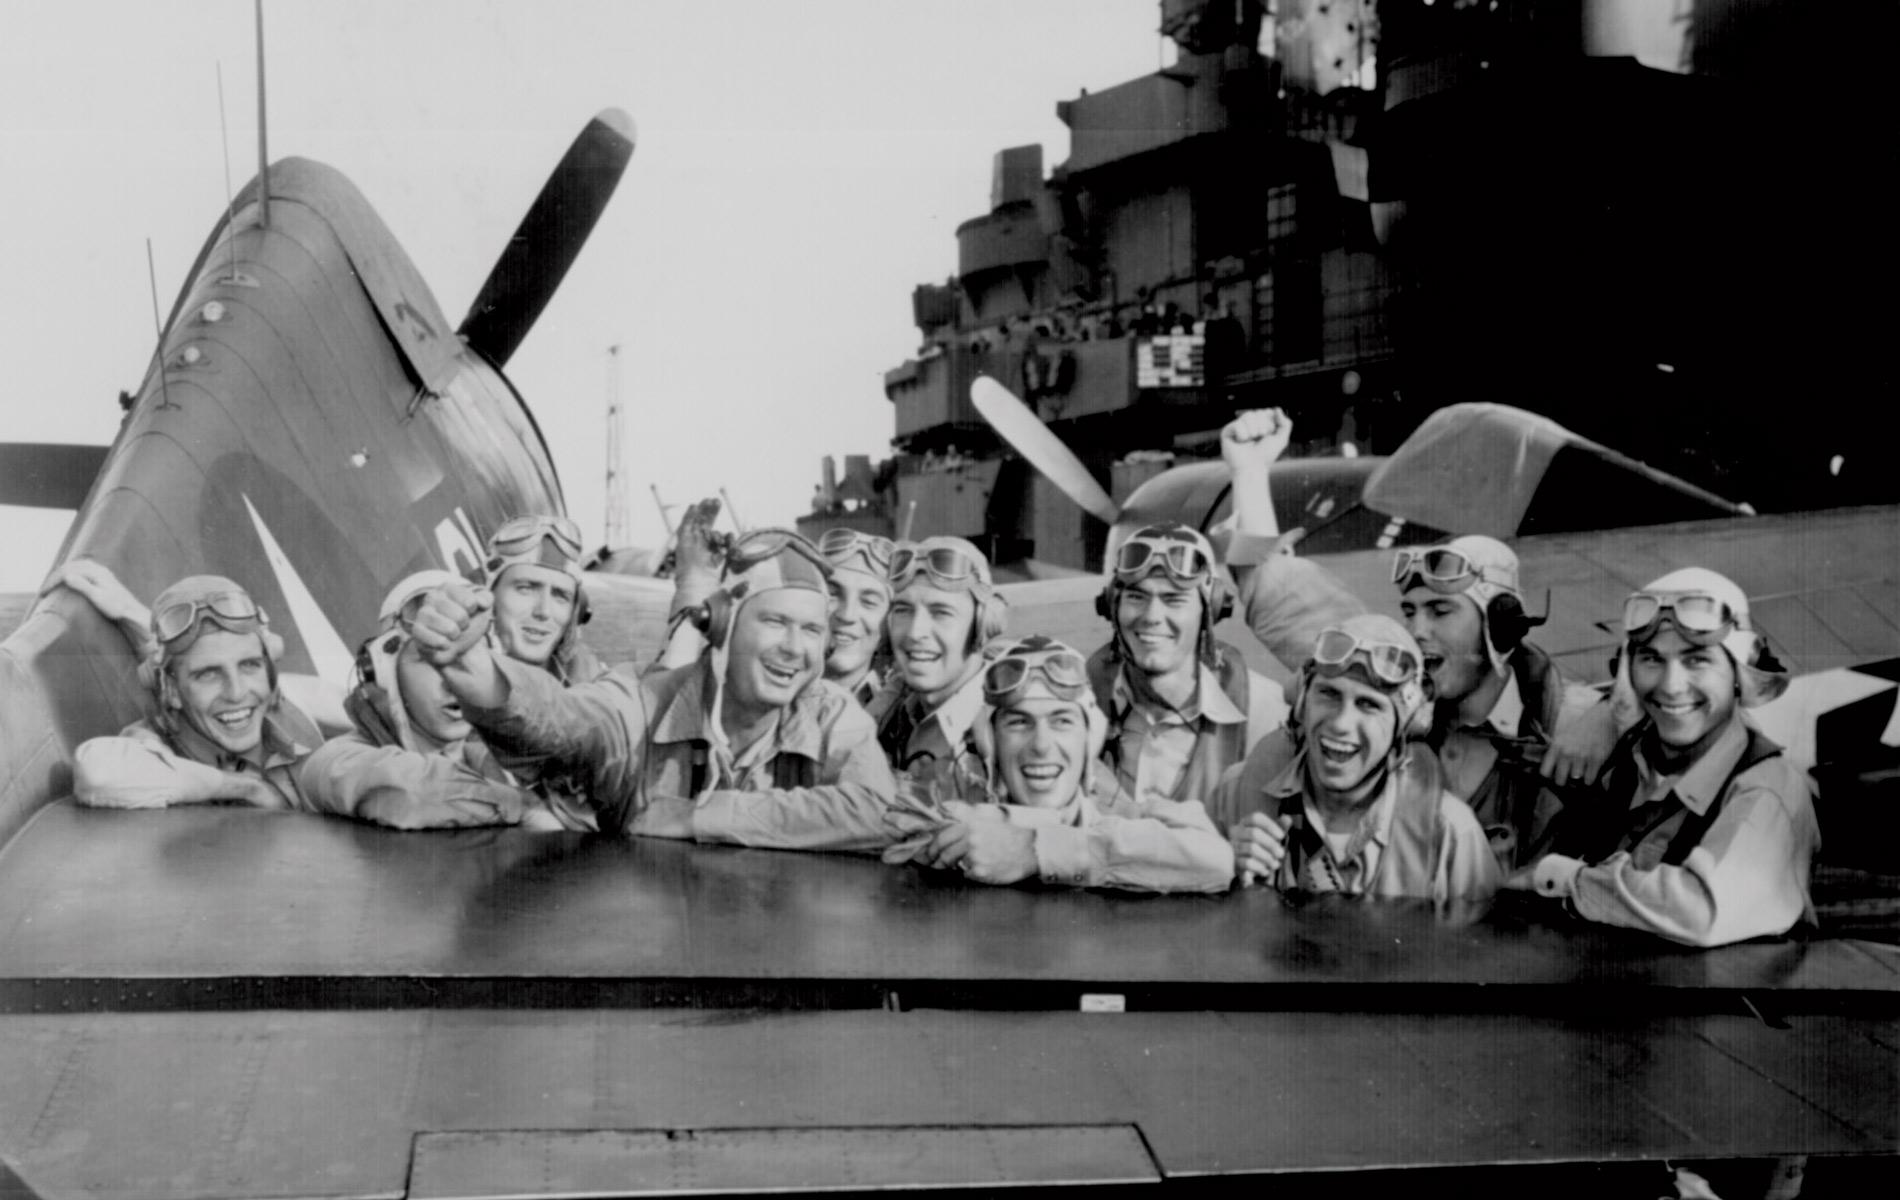 vie-magazine-naval-aviation-centennial-feature